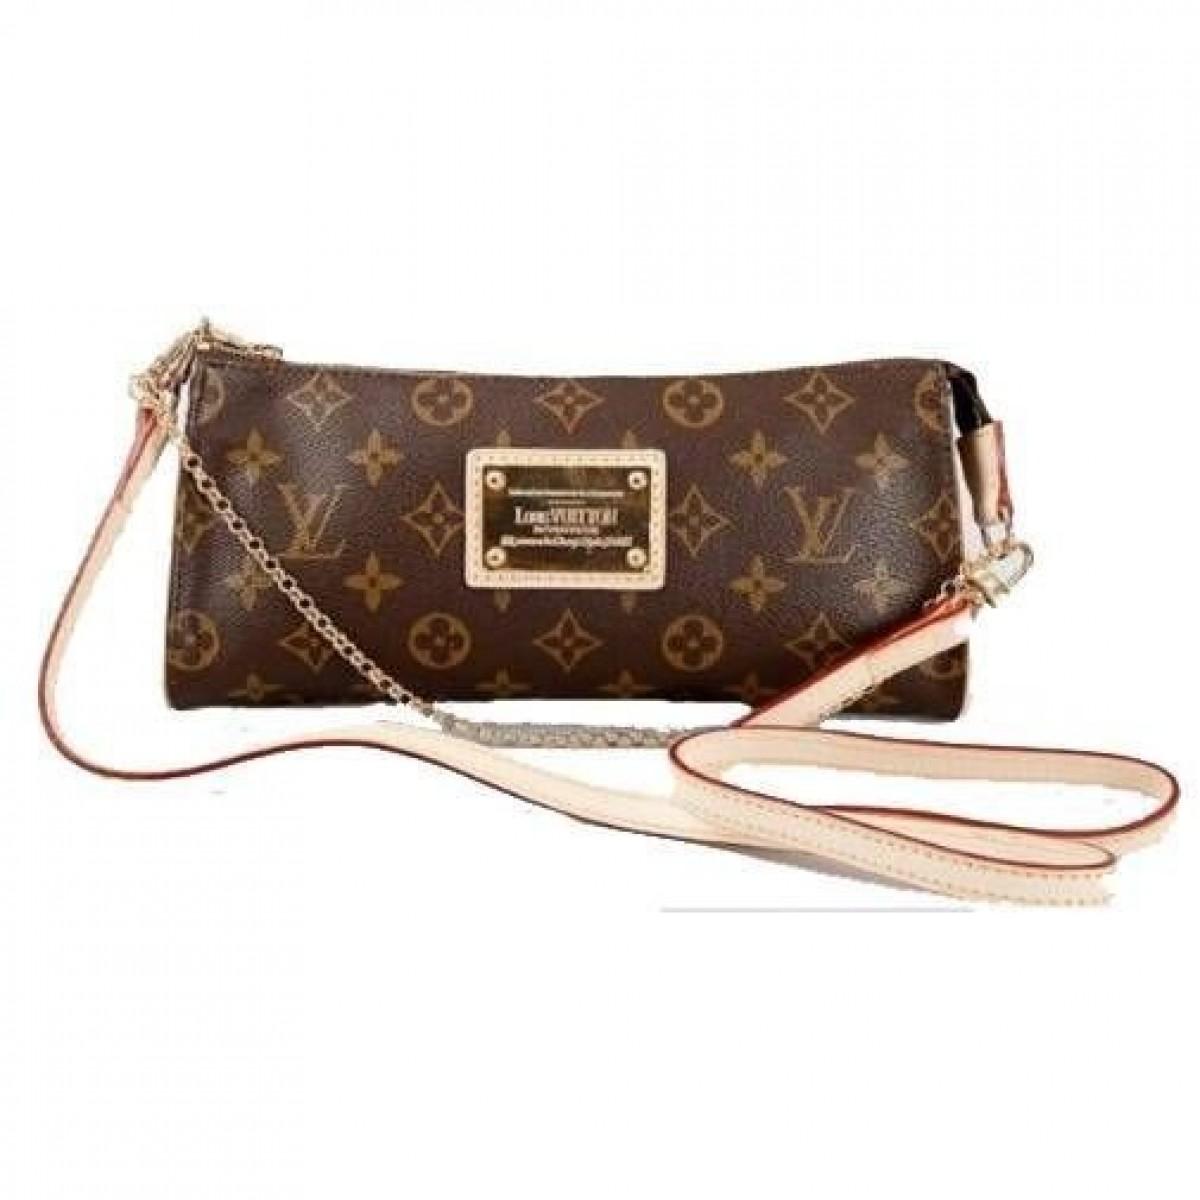 ac9240ffa Bolsa Louis Vuitton Eva Clutch Original | Stanford Center for ...